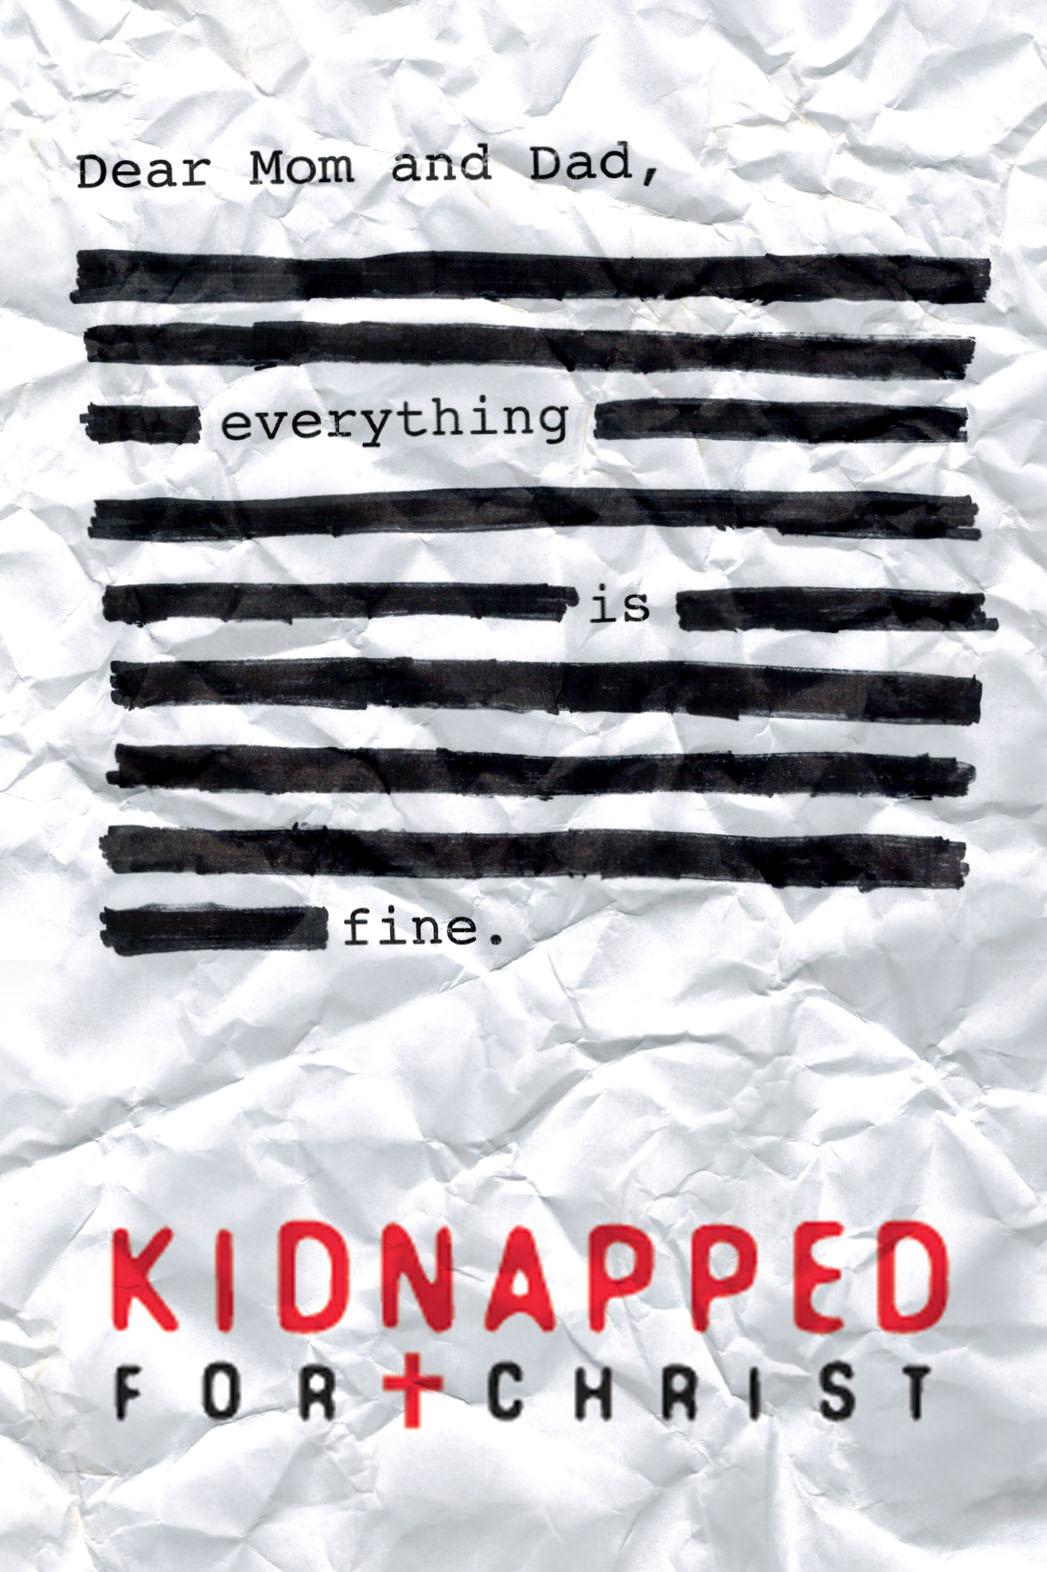 Kidnapped For Christ Poster Art - P 2014